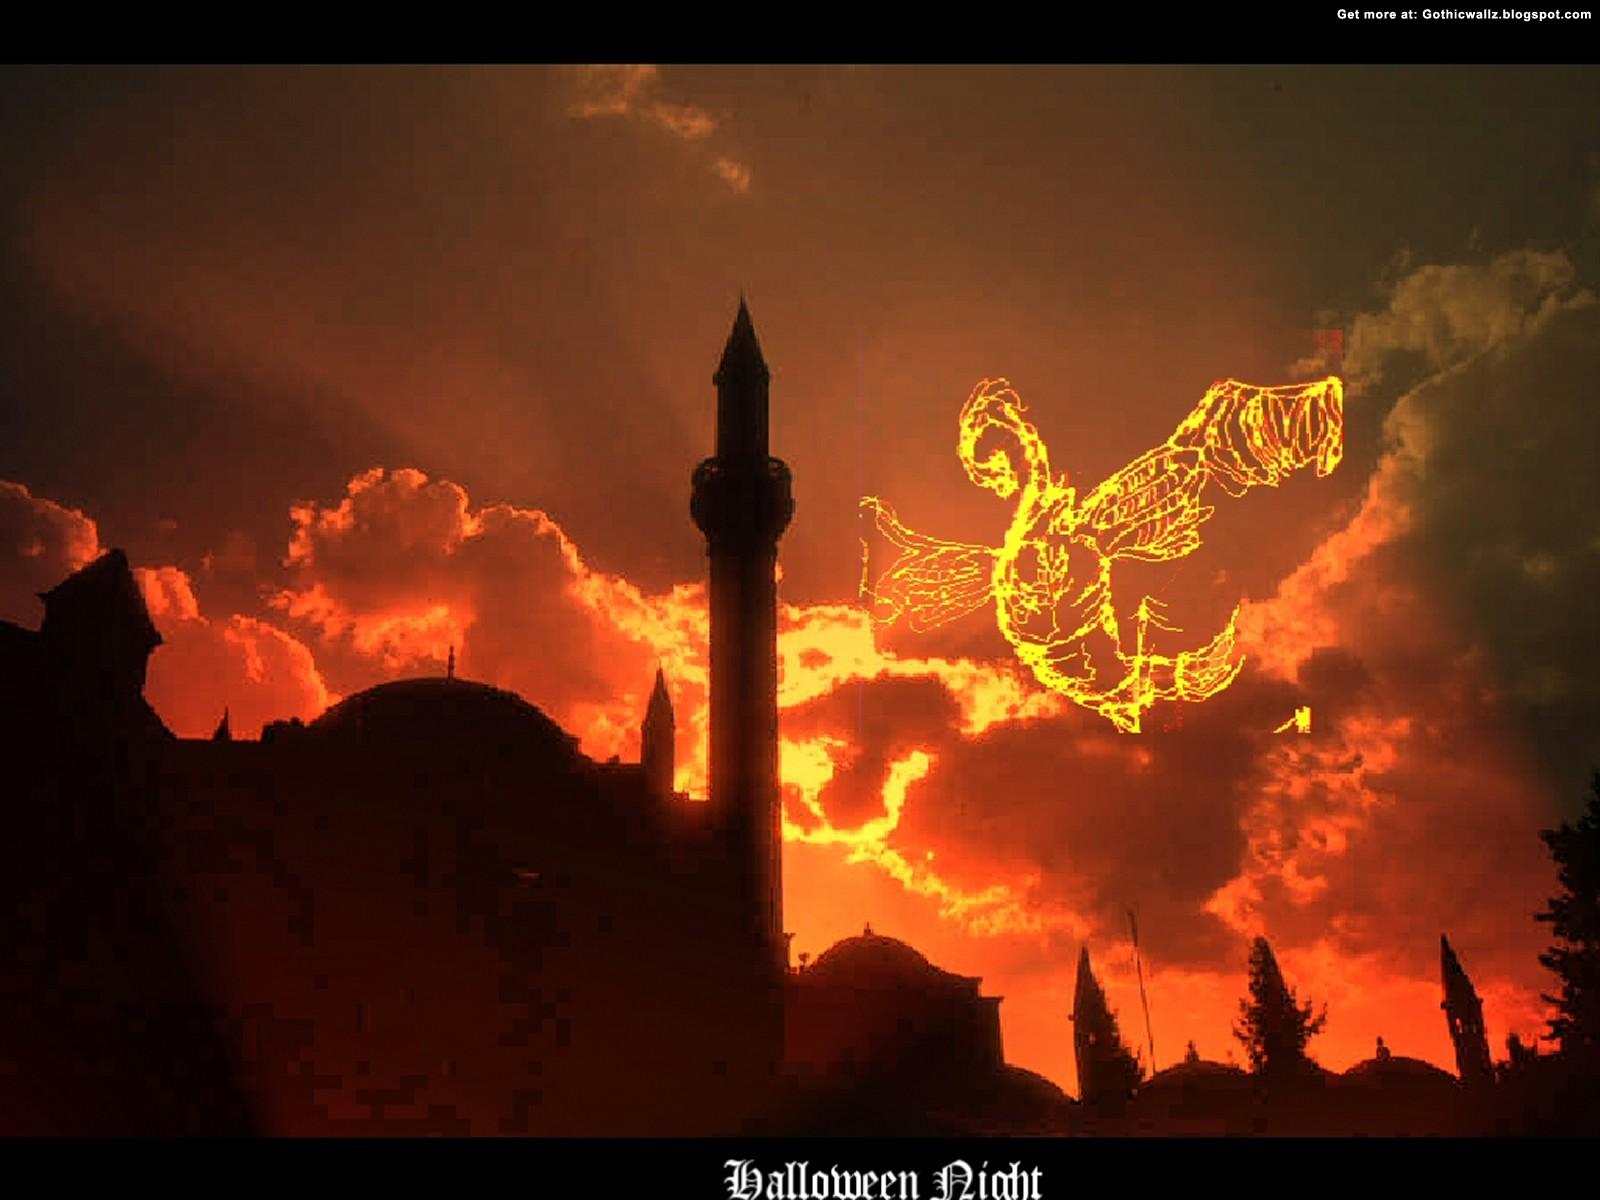 HaLLoWeeN NiGhT | Gothic Wallpaper Download